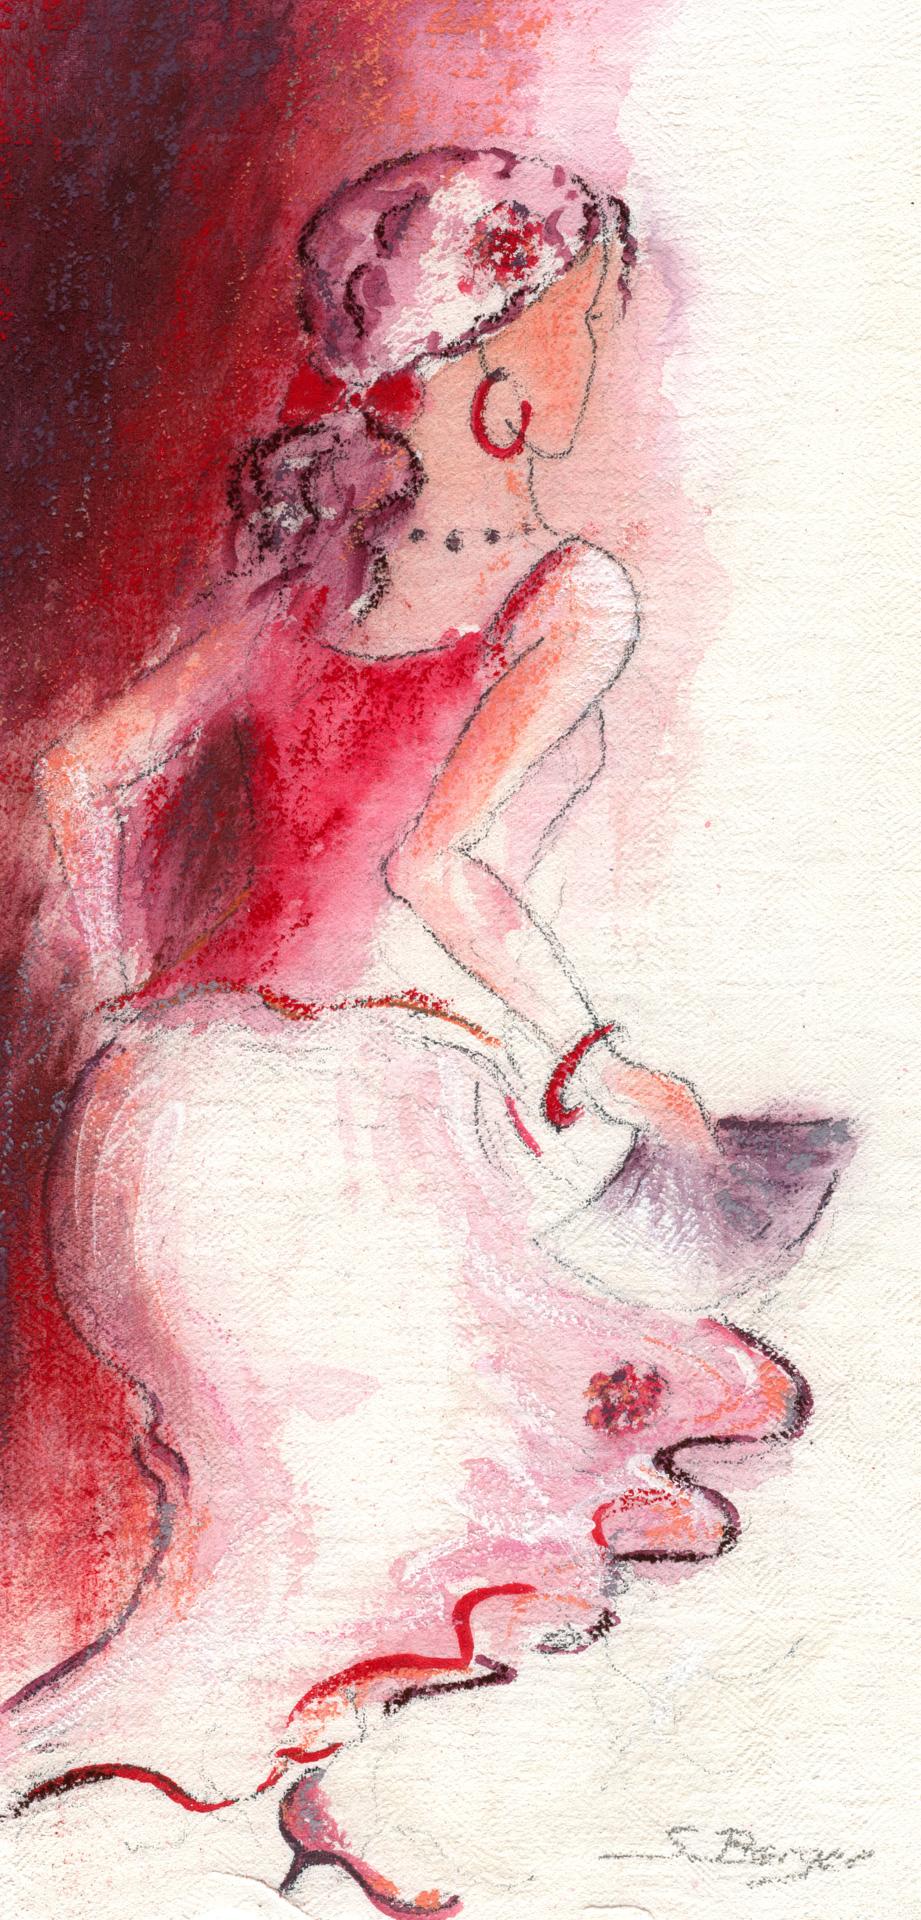 Flamenco, variation 1